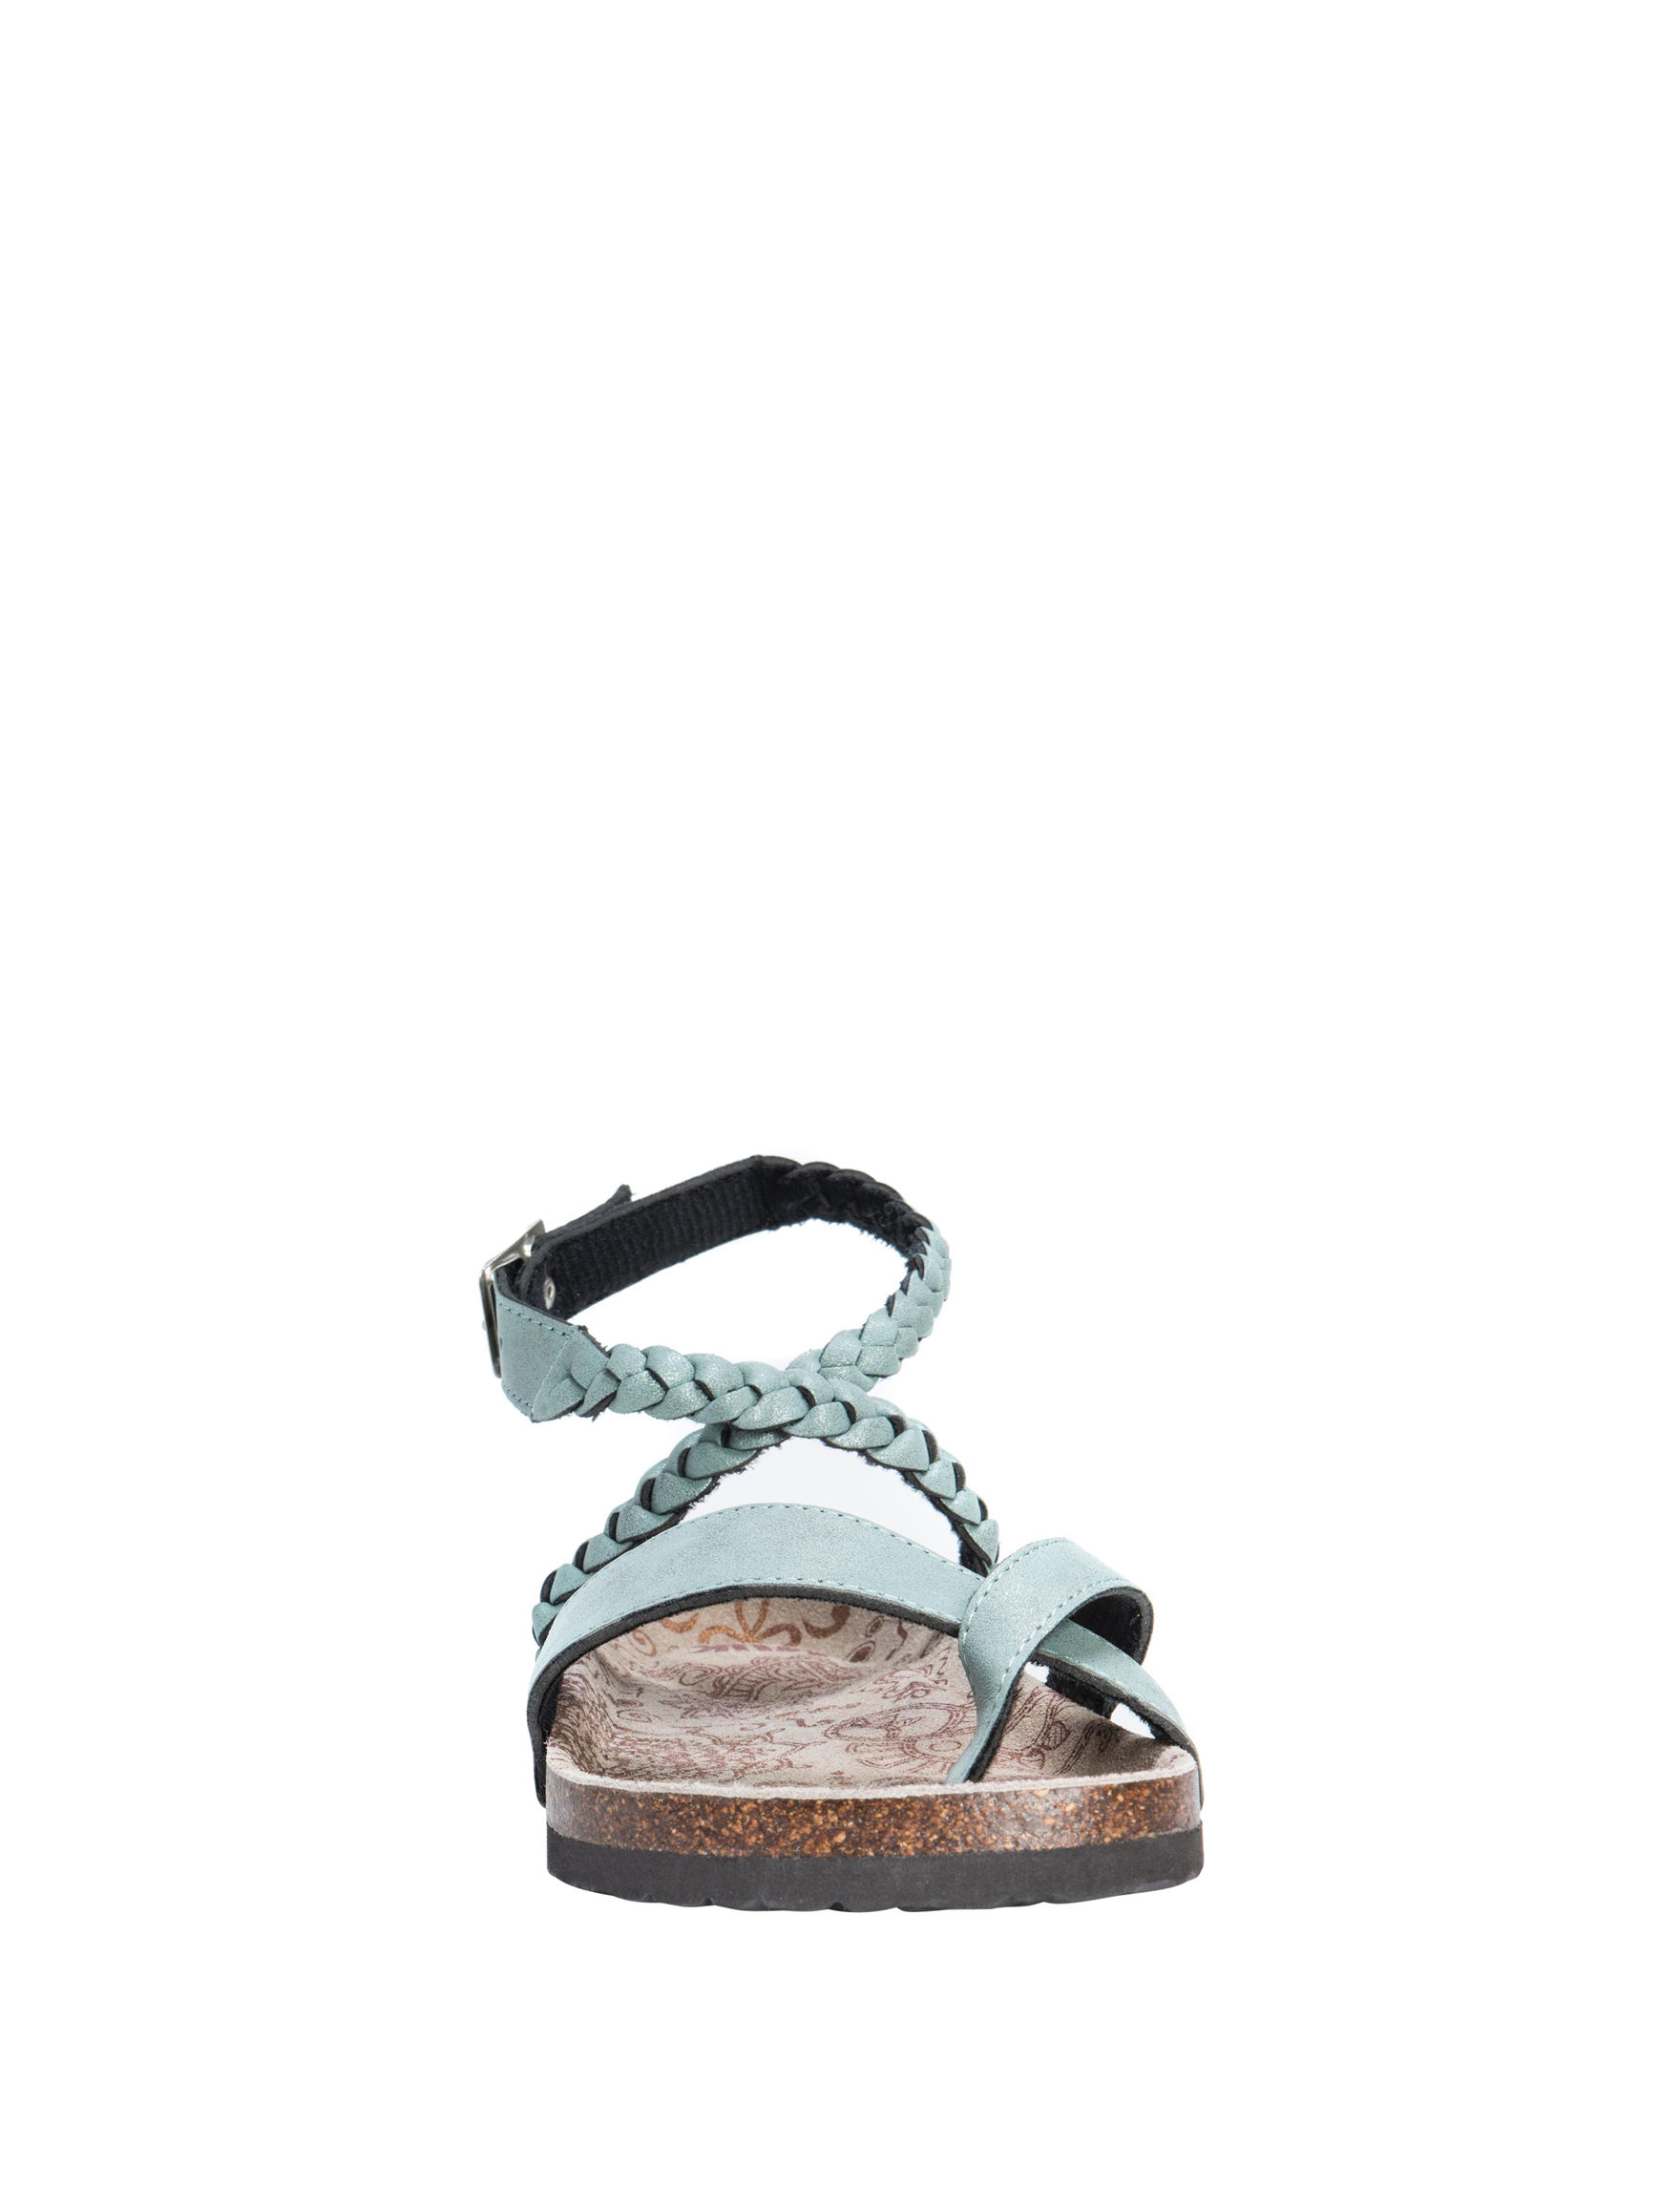 Muk Luks Jade Flat Sandals